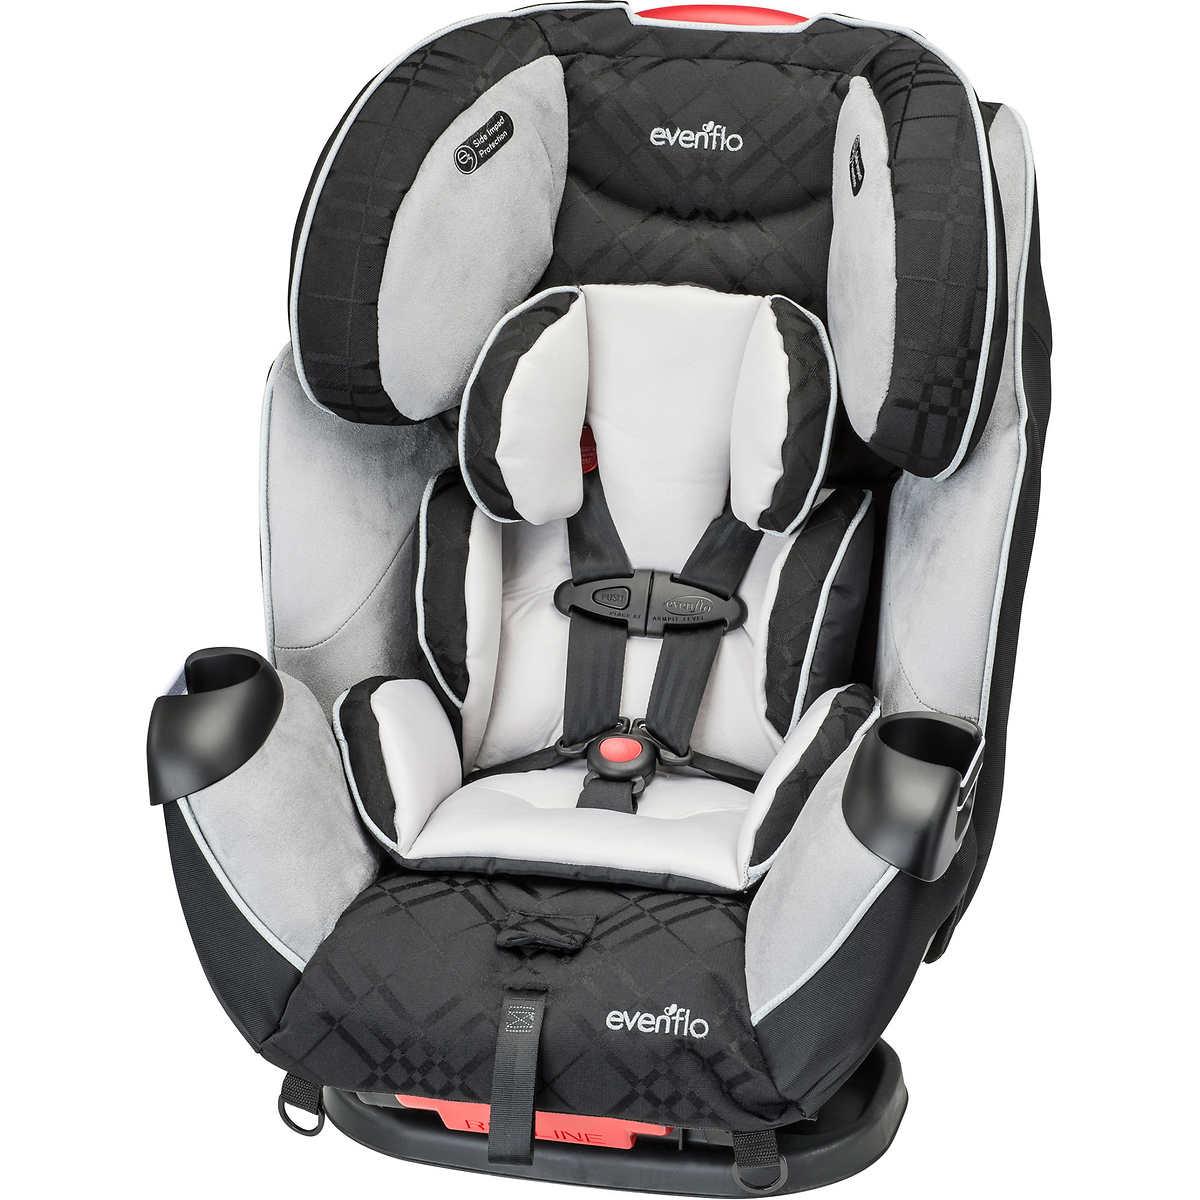 Graco nautilus 3 in 1 multi use car seat - Evenflo Symphony Lx Car Seat Crete